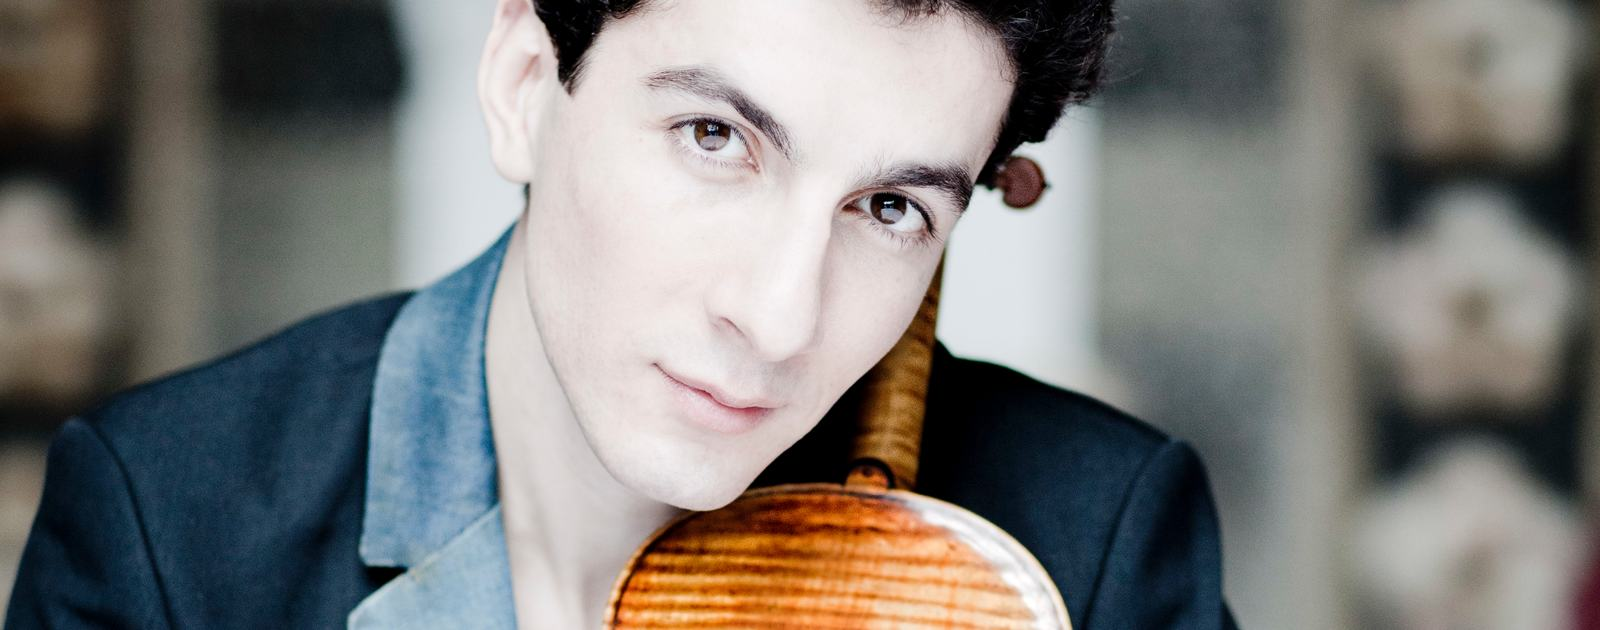 Sergey Khachatryan.Violin.Photo: Marco Borggreve